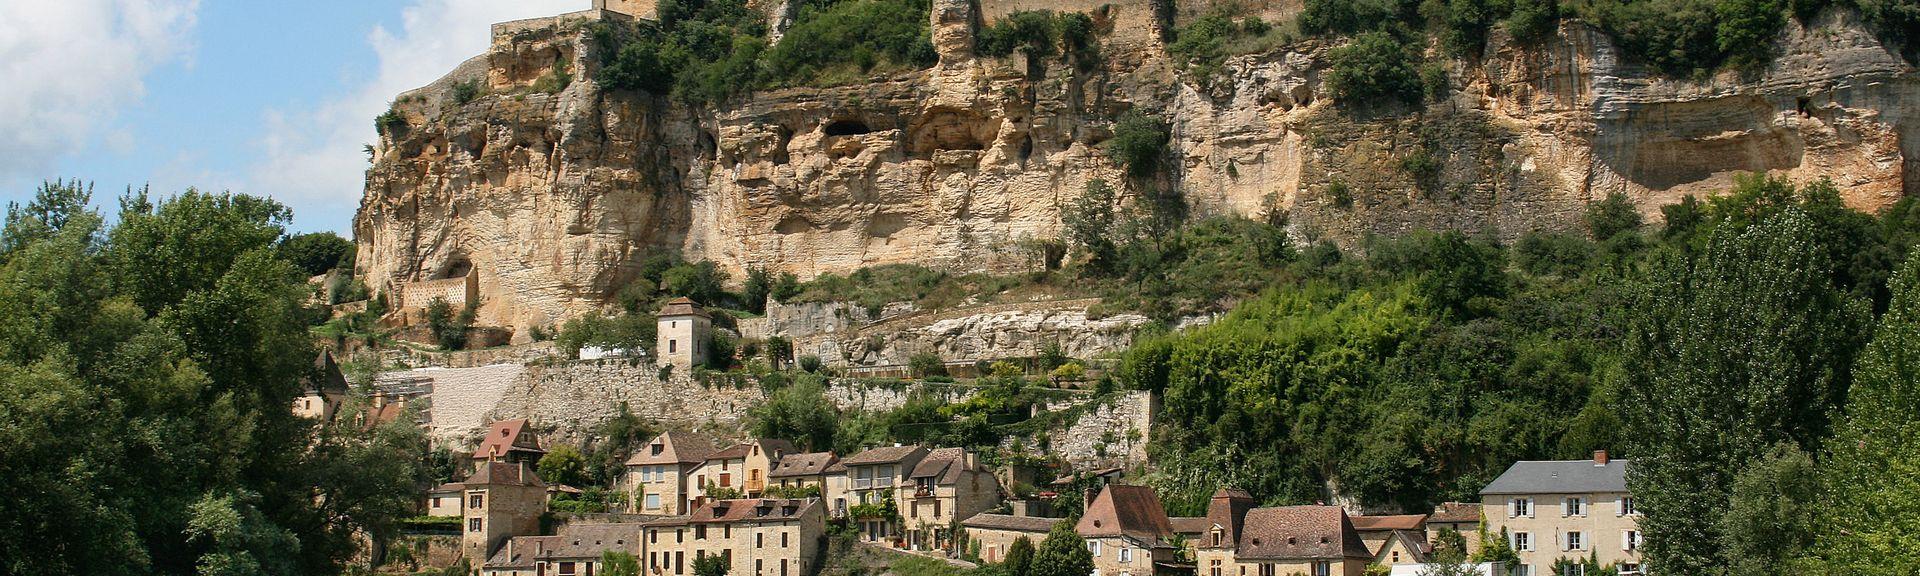 Ardèche, Auvergne-Rhône-Alpes, France